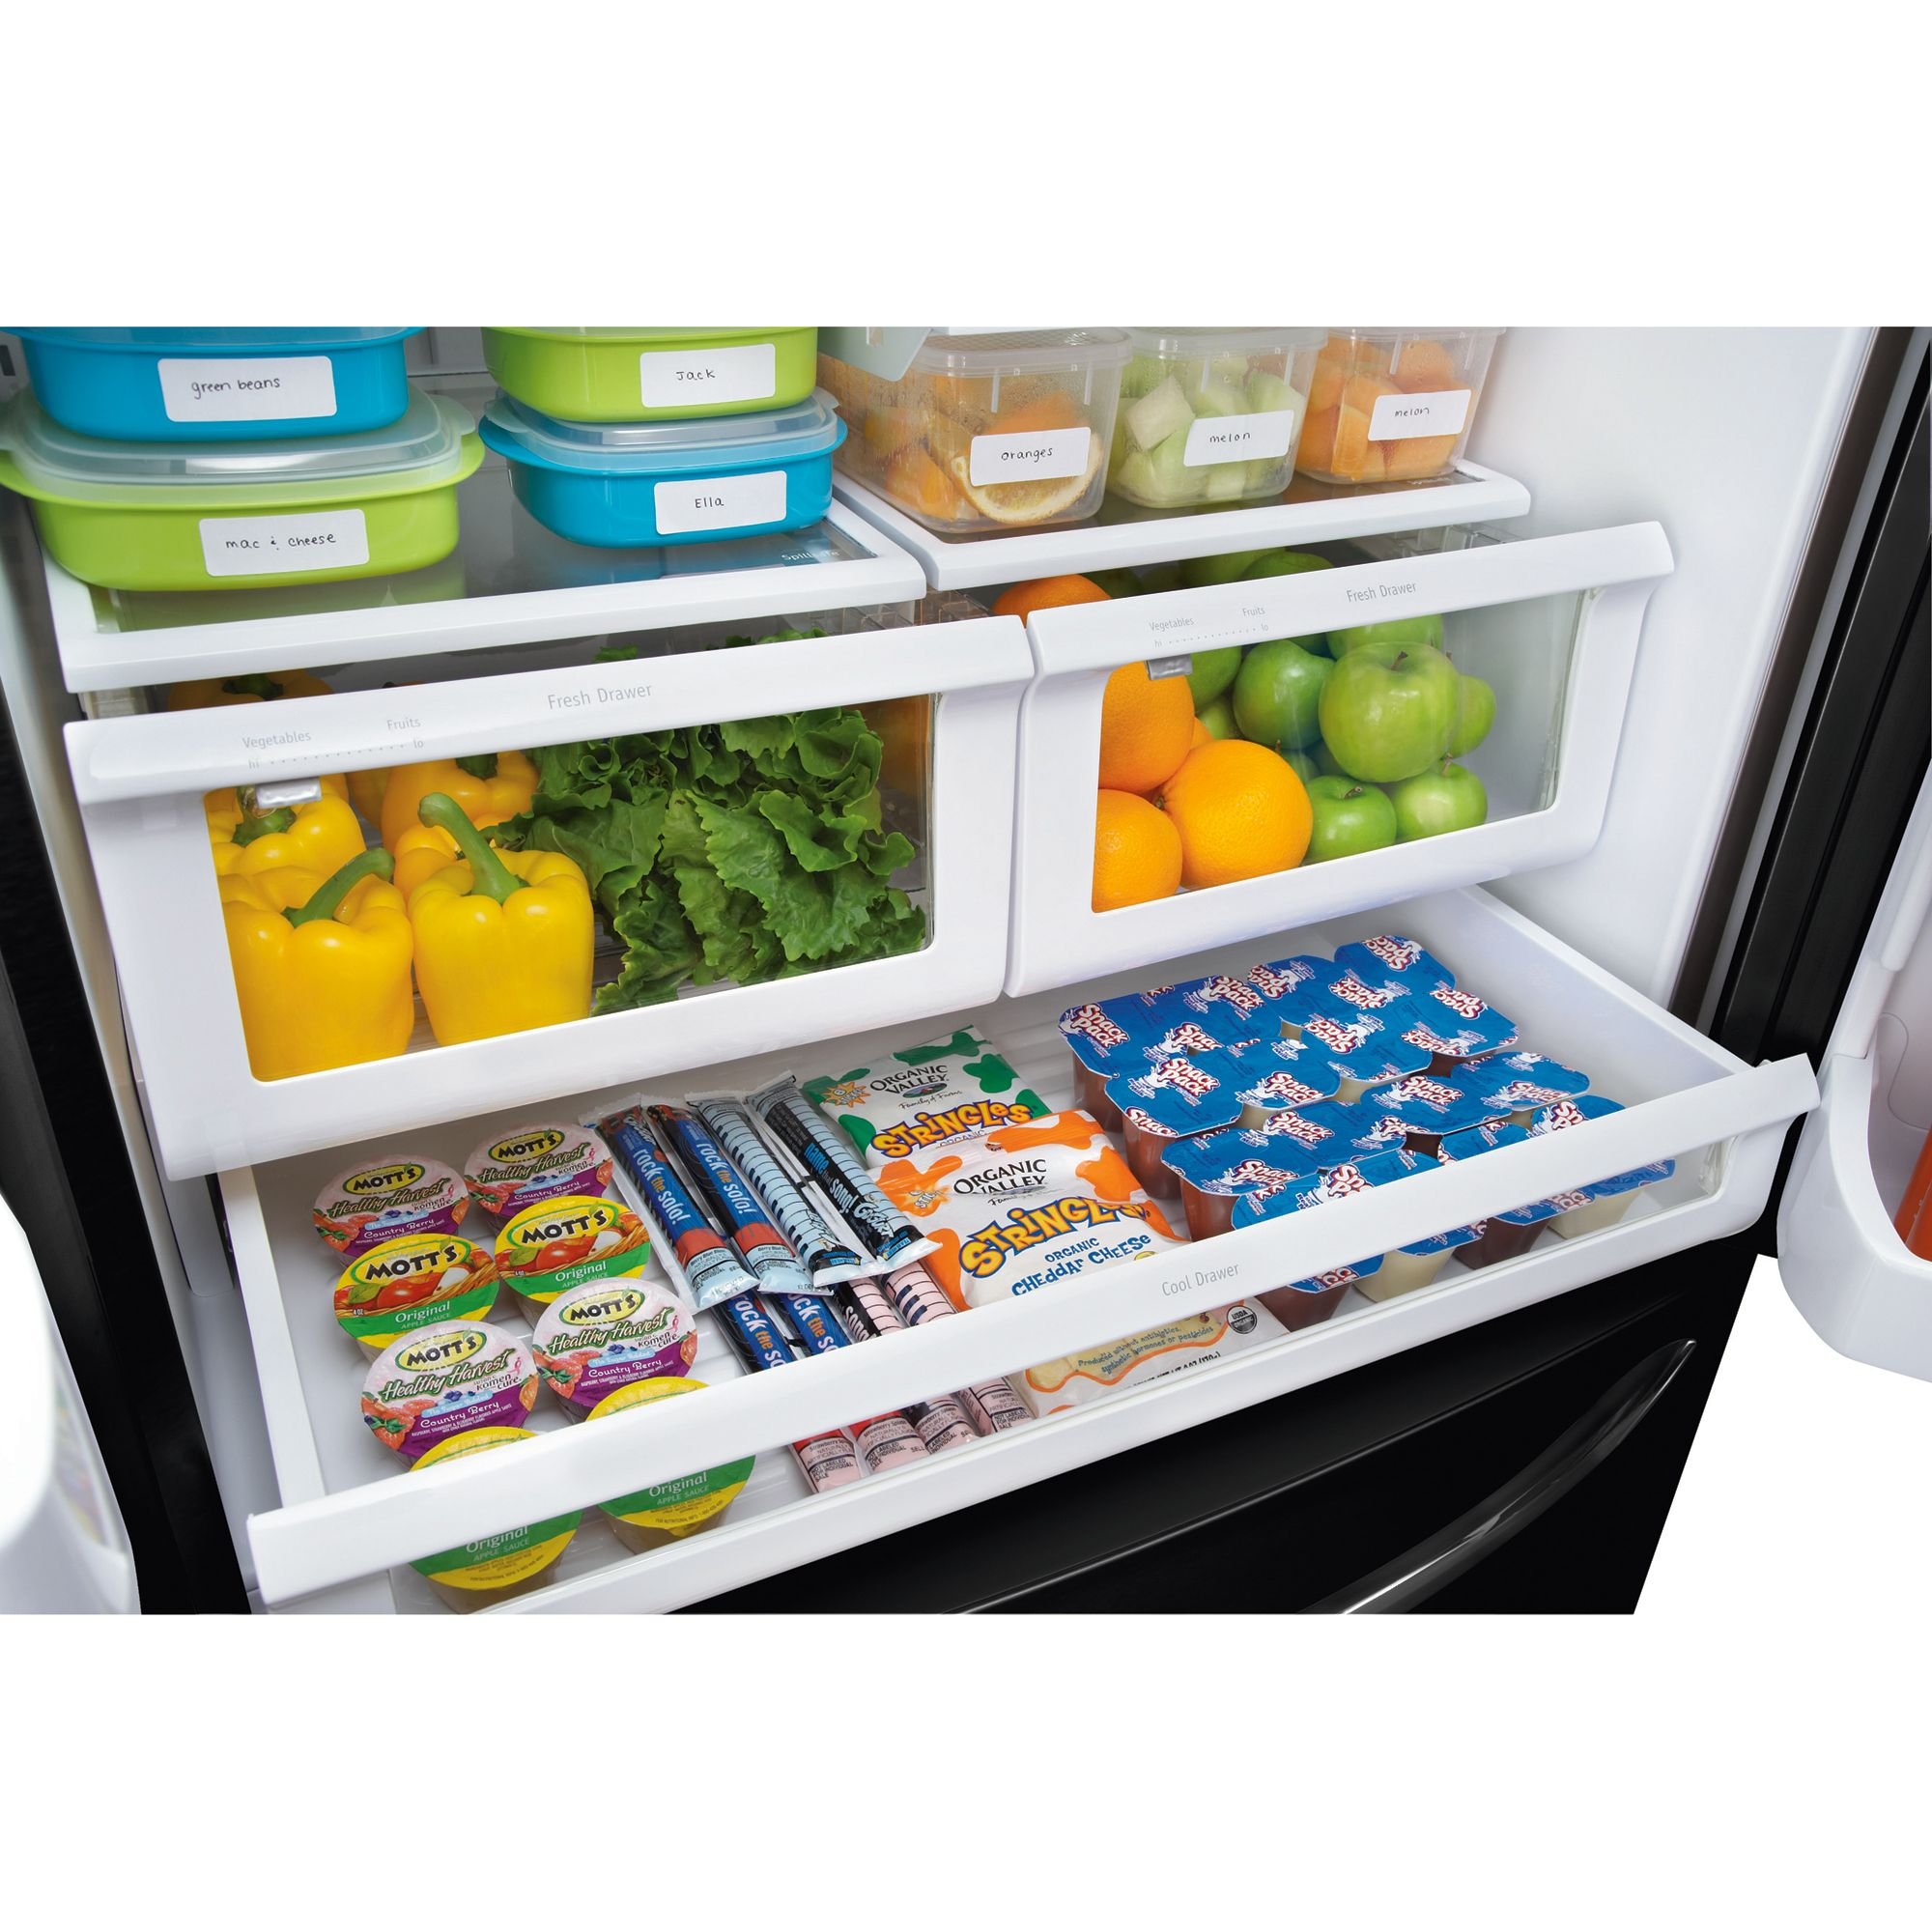 Frigidaire 27.8 cu. ft. French-Door Bottom-Freezer Refrigerator (FGHB2869L)